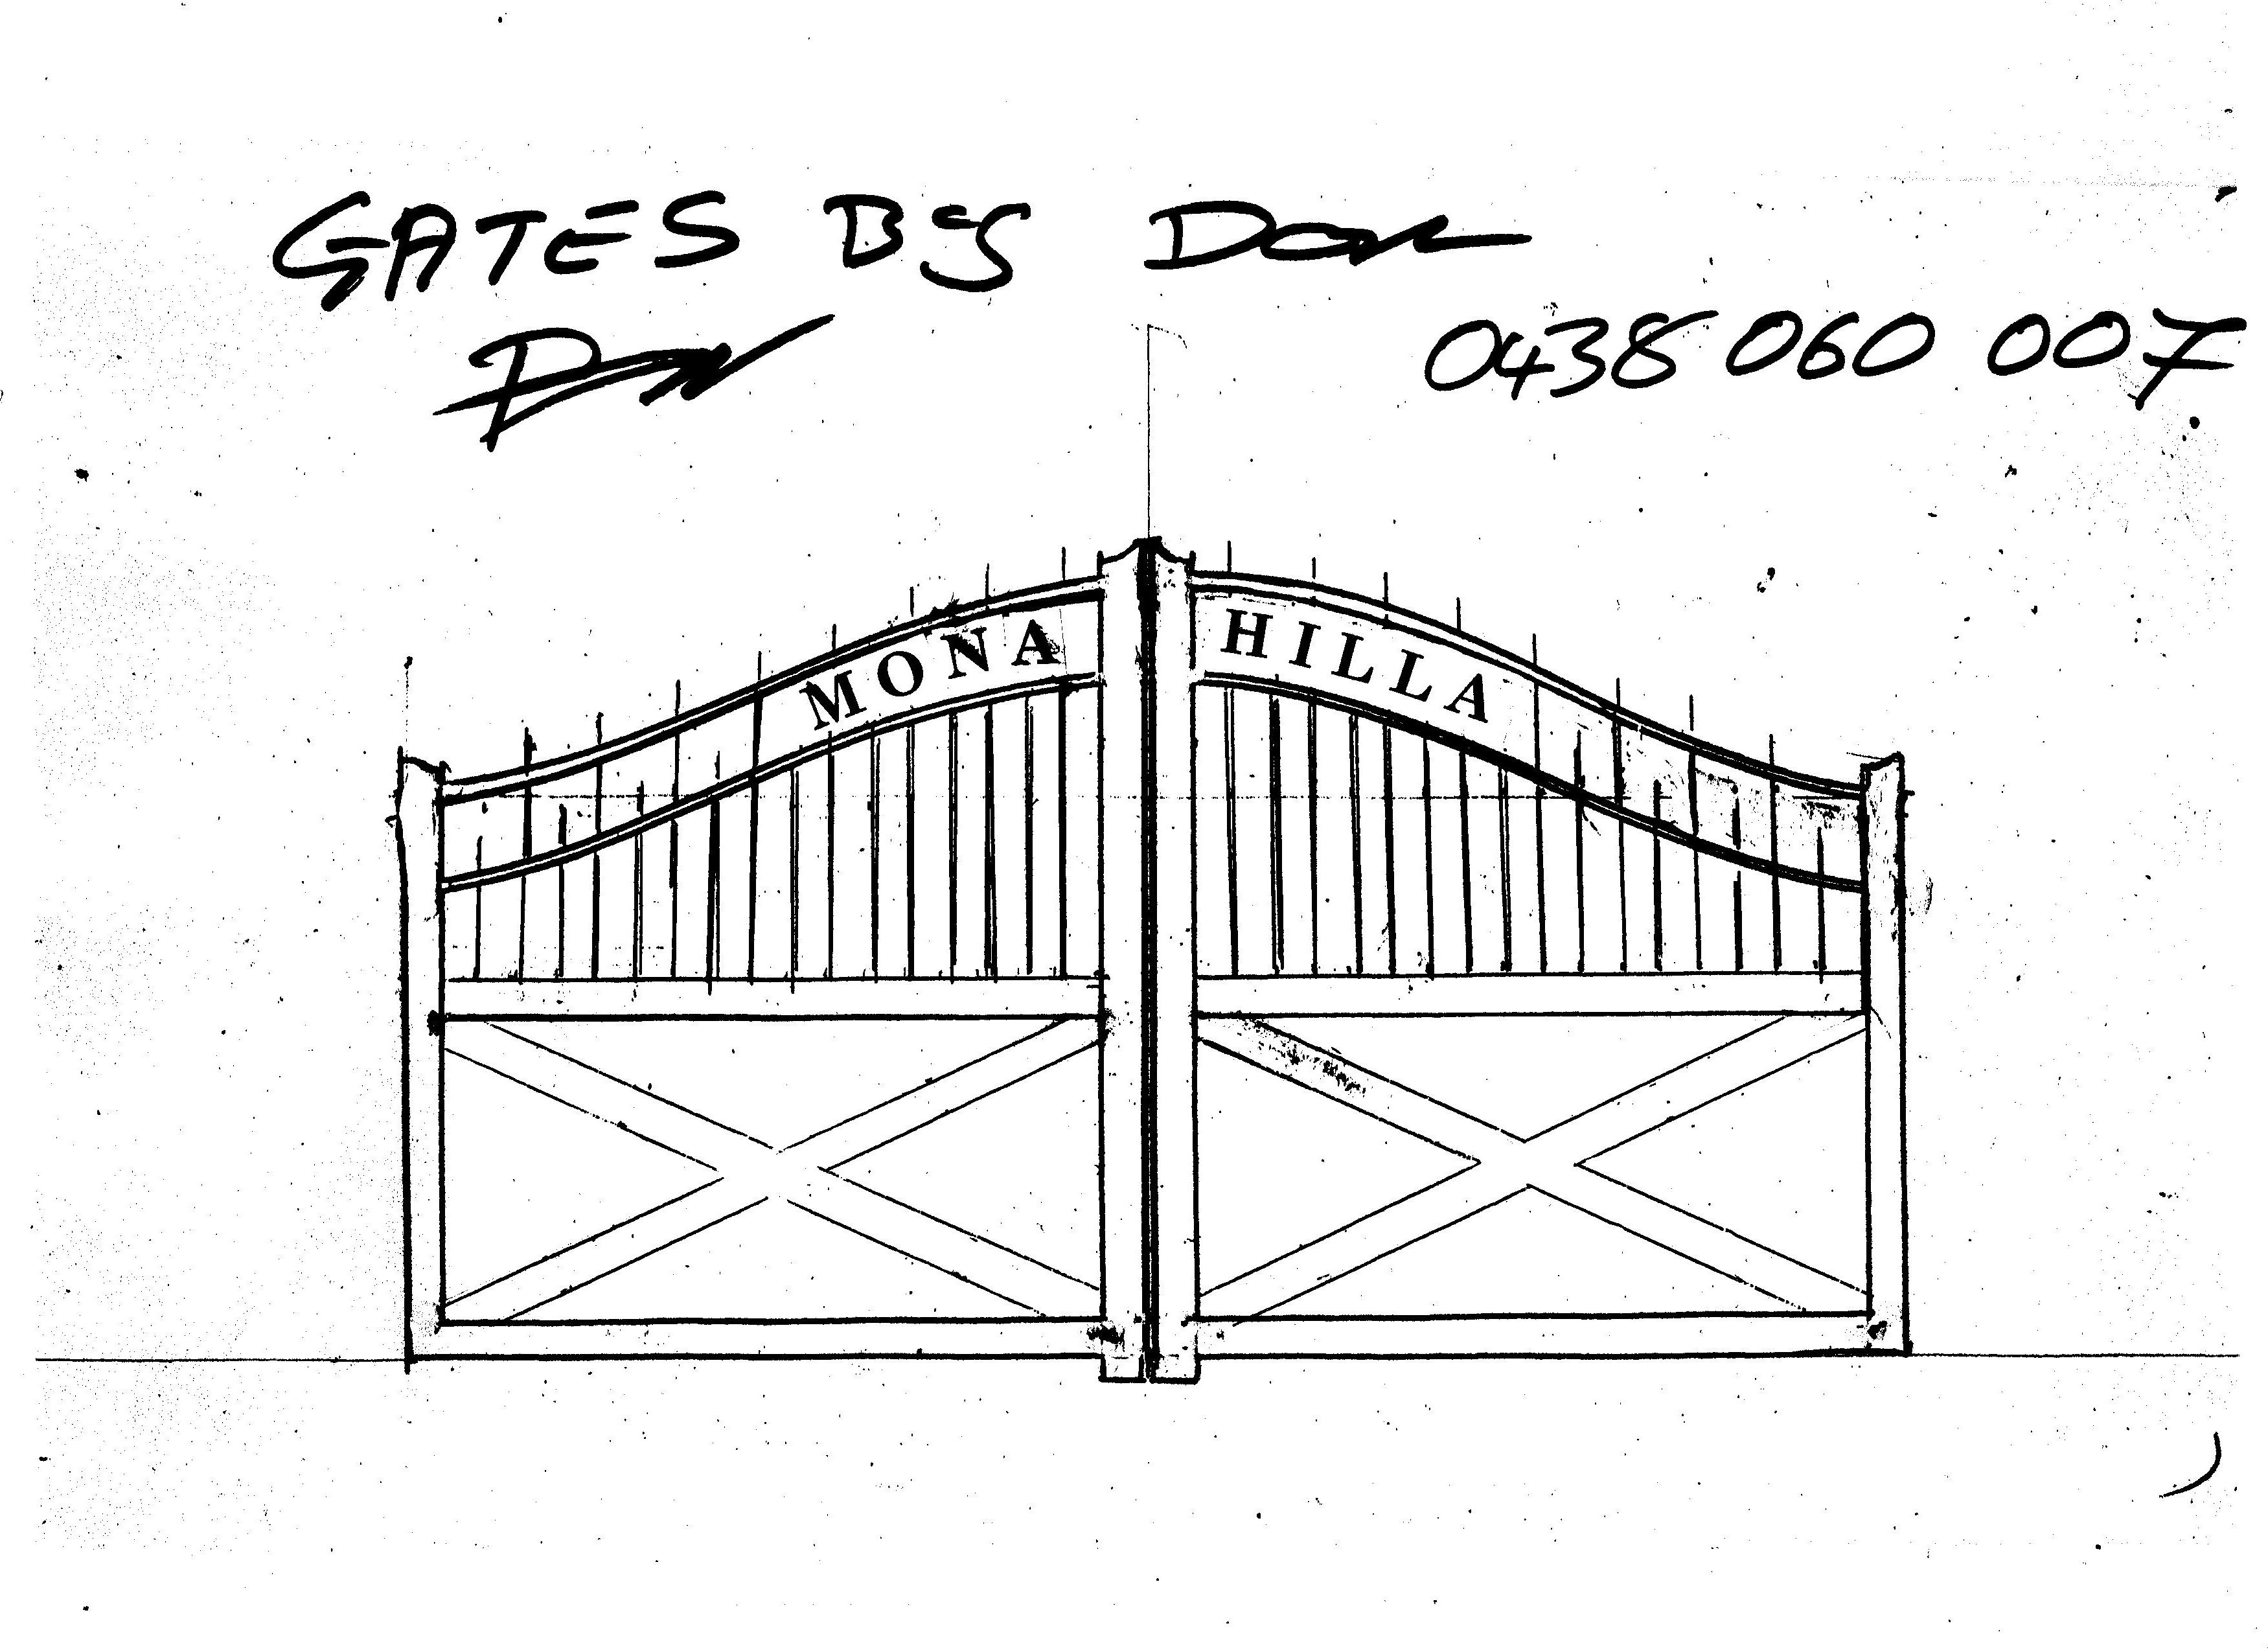 Custom fabrication work drawing